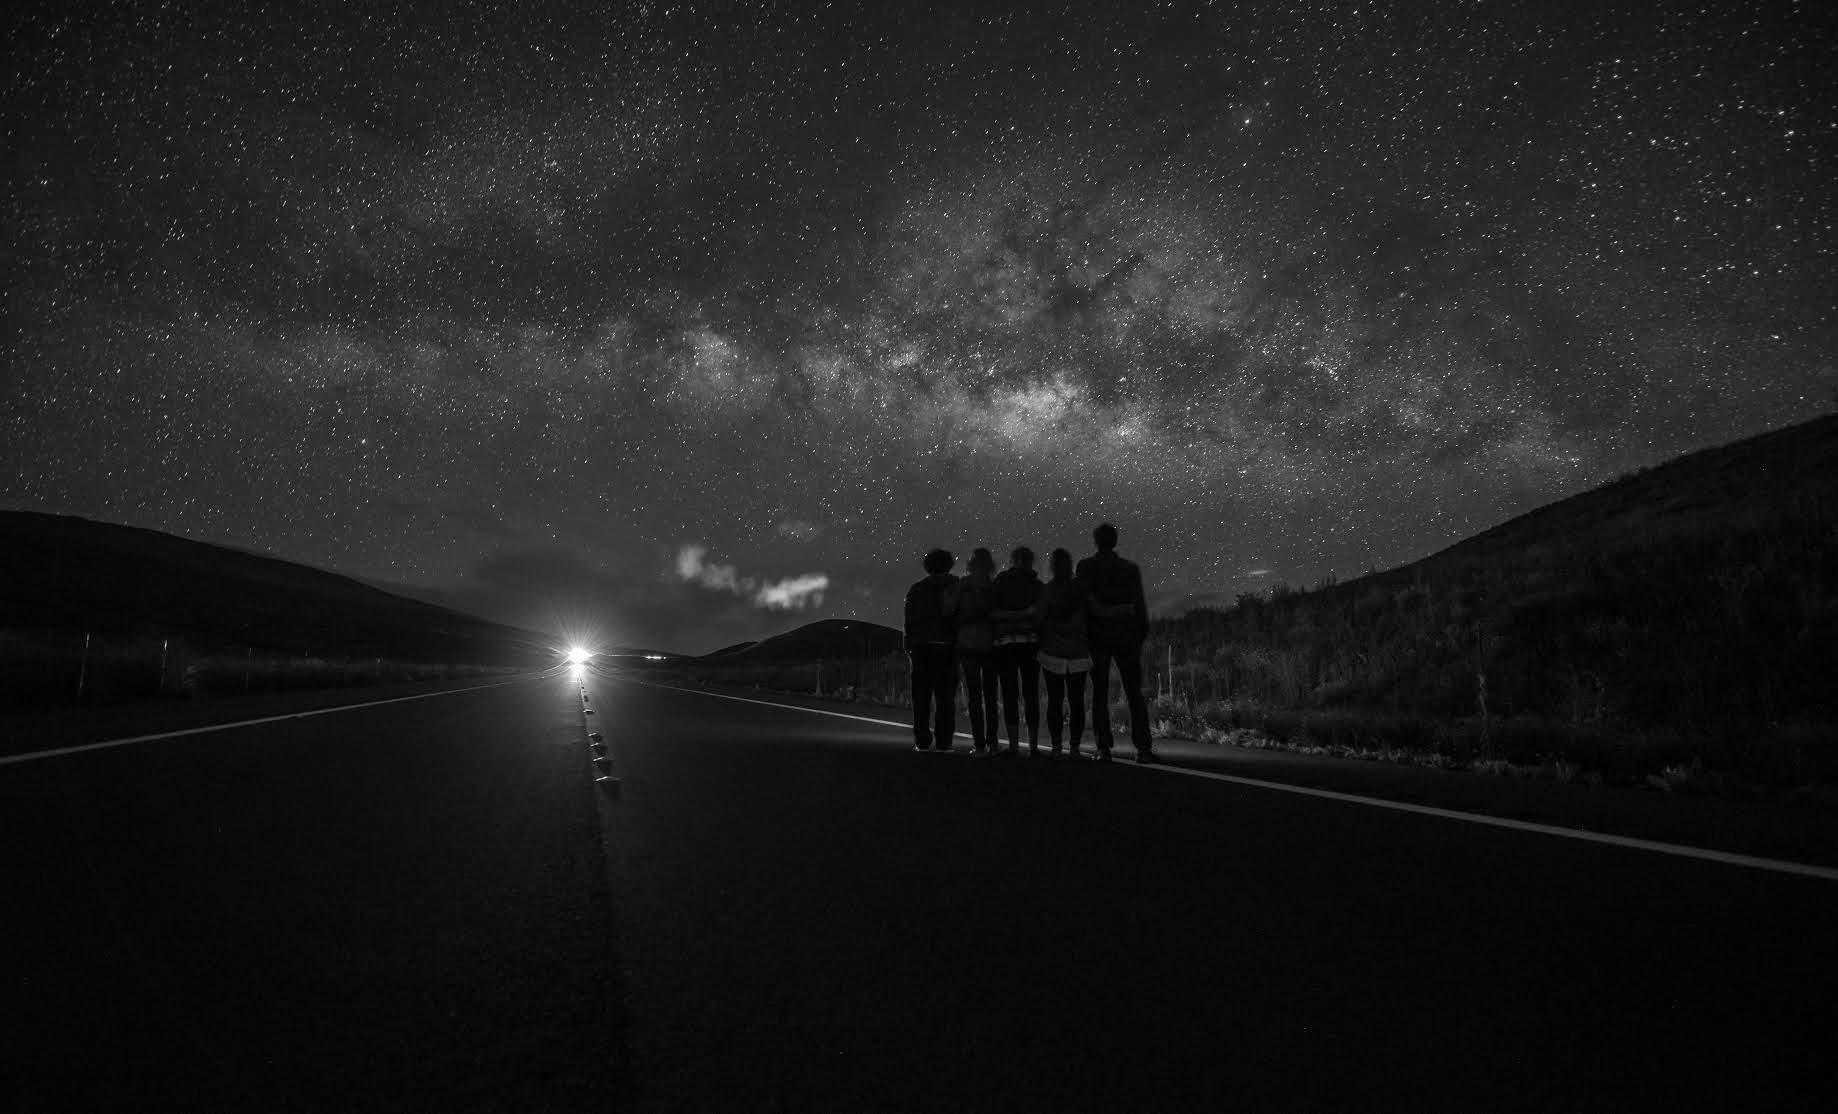 Beneath Mauna Kea, admiring the Milky Way (PC- Heather Morse).